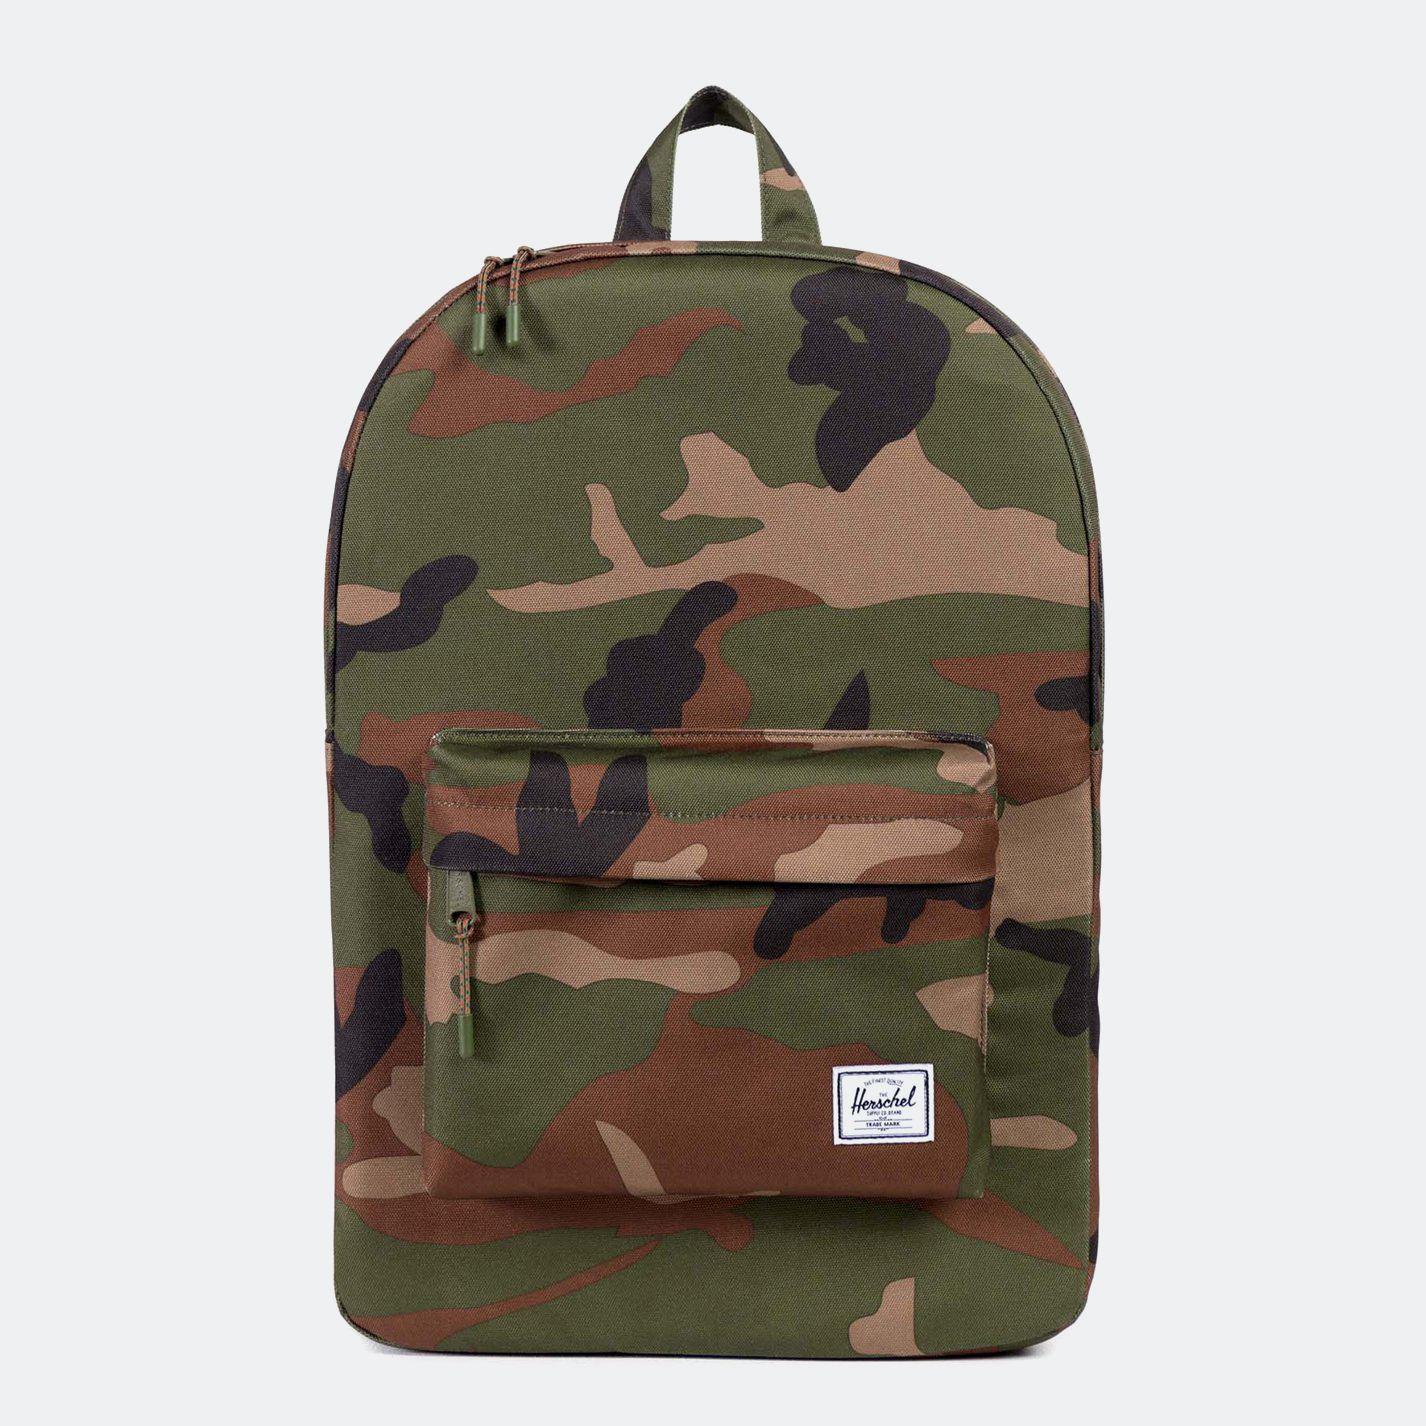 Herschel Classic Backpack   Large (30814500340_19710)